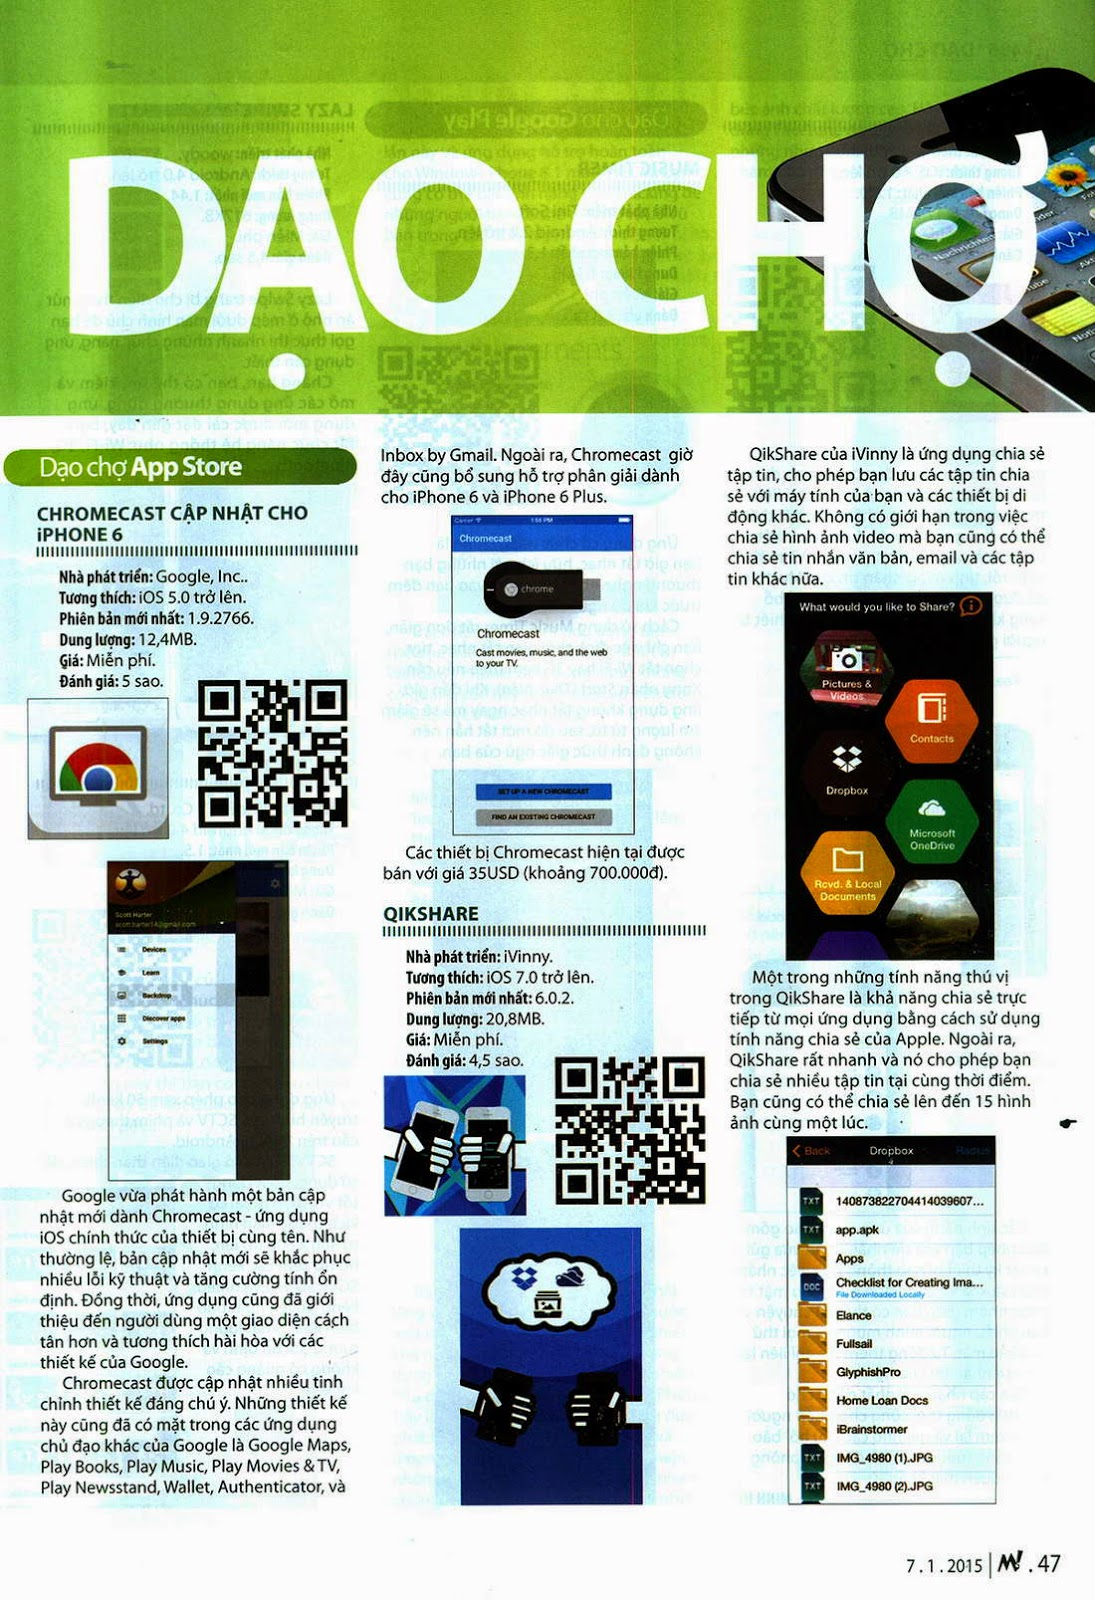 EChip Mobile 486 tapchicntt.com